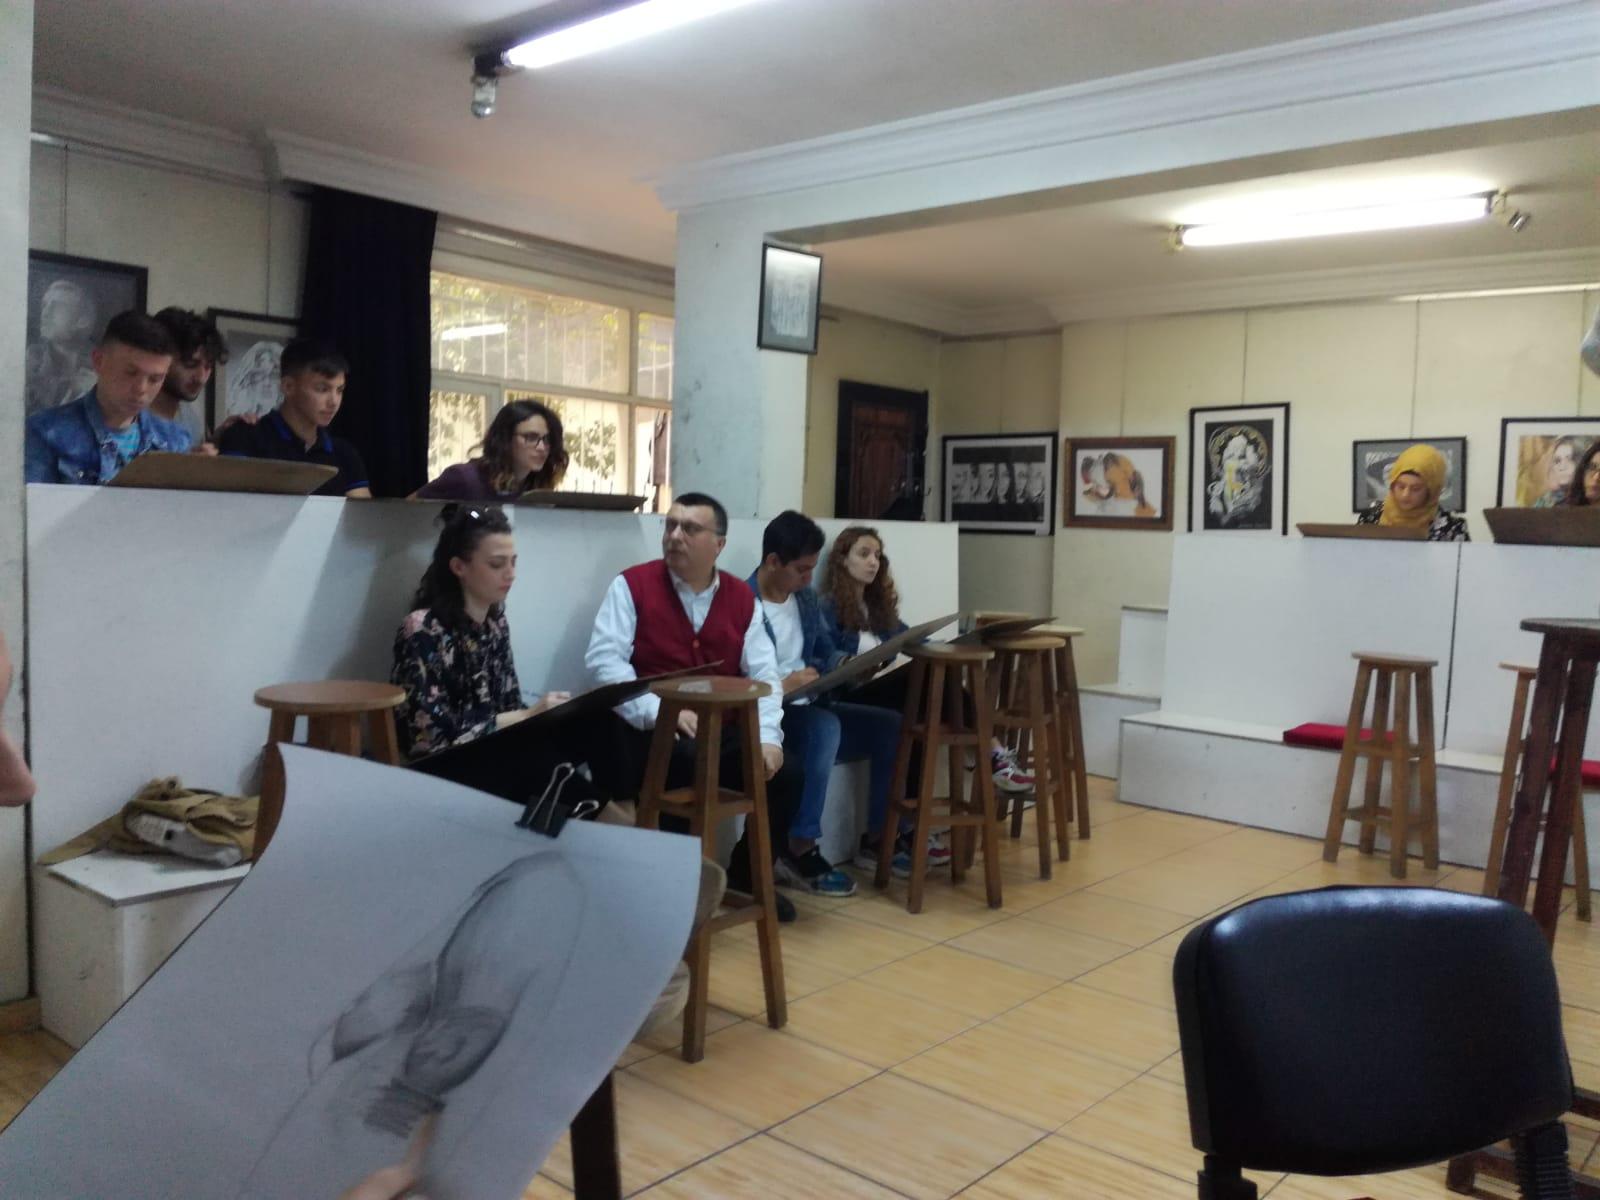 Ankarada Ücretsiz resim Kursları